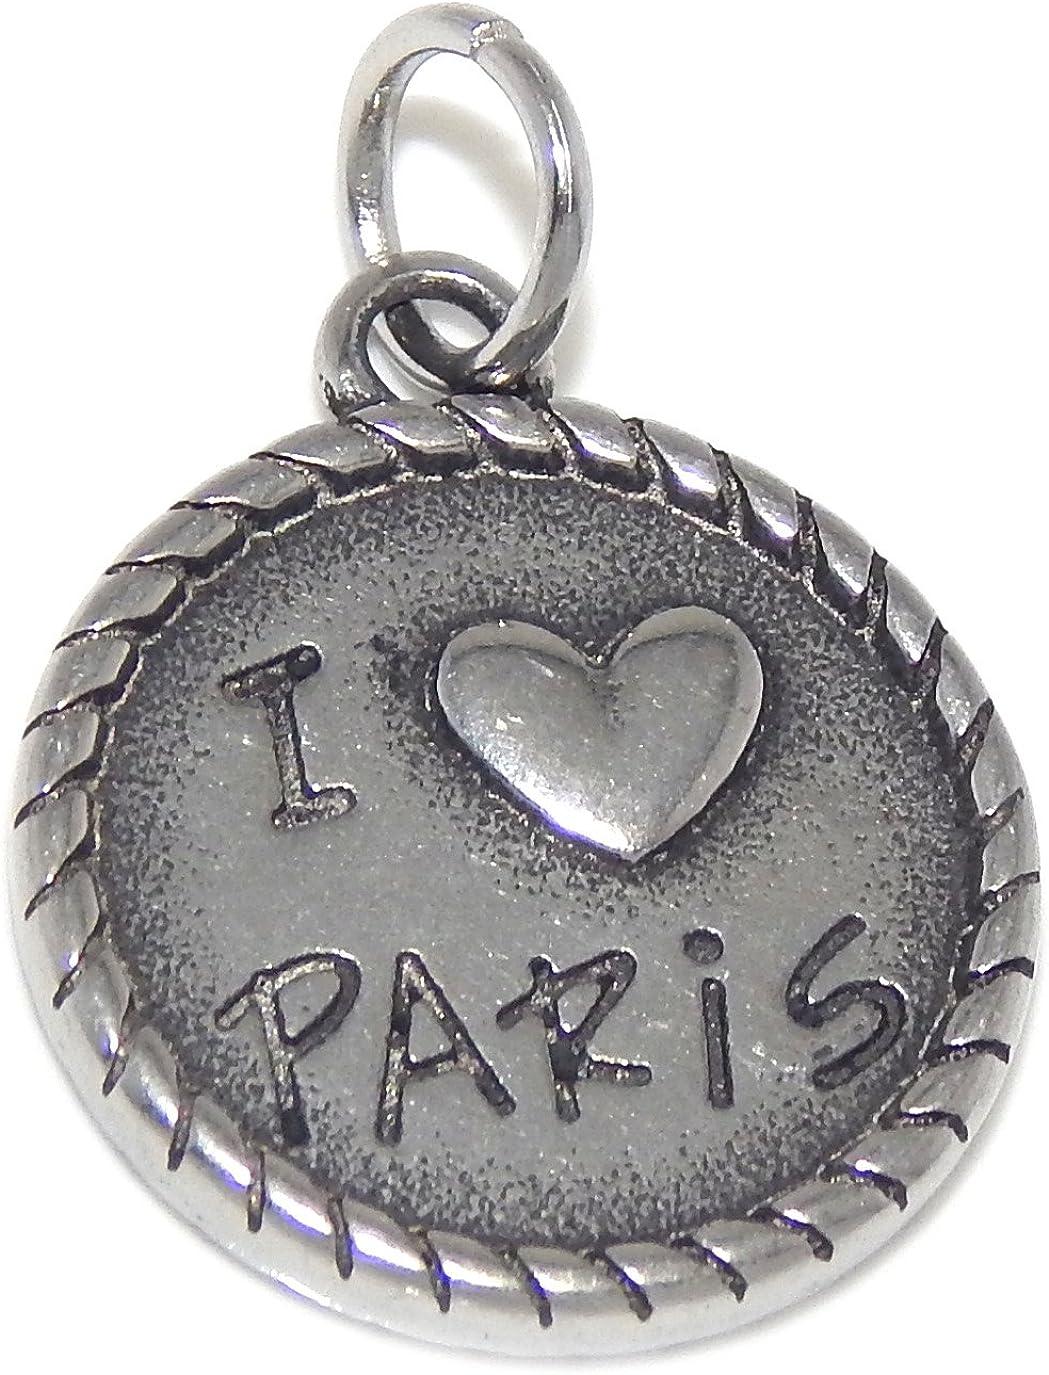 ICYROSE Stainless Steel Dangling I Love Paris/Eiffel Tower Charm Bead 098 for European Snake Chain Bracelets